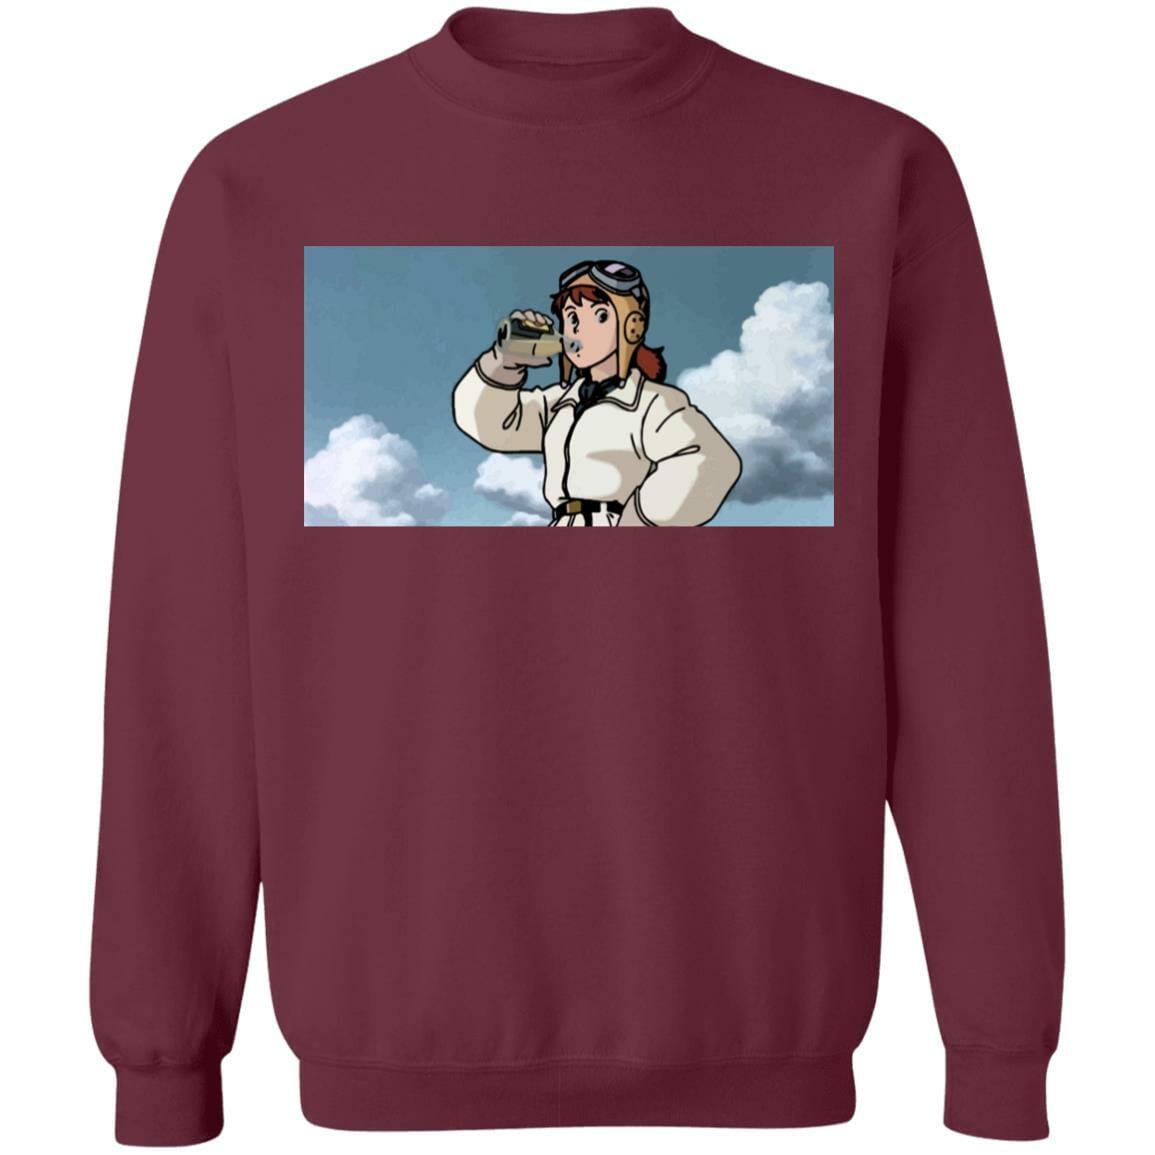 Porco Rosso – Fio Poccolo Sweatshirt